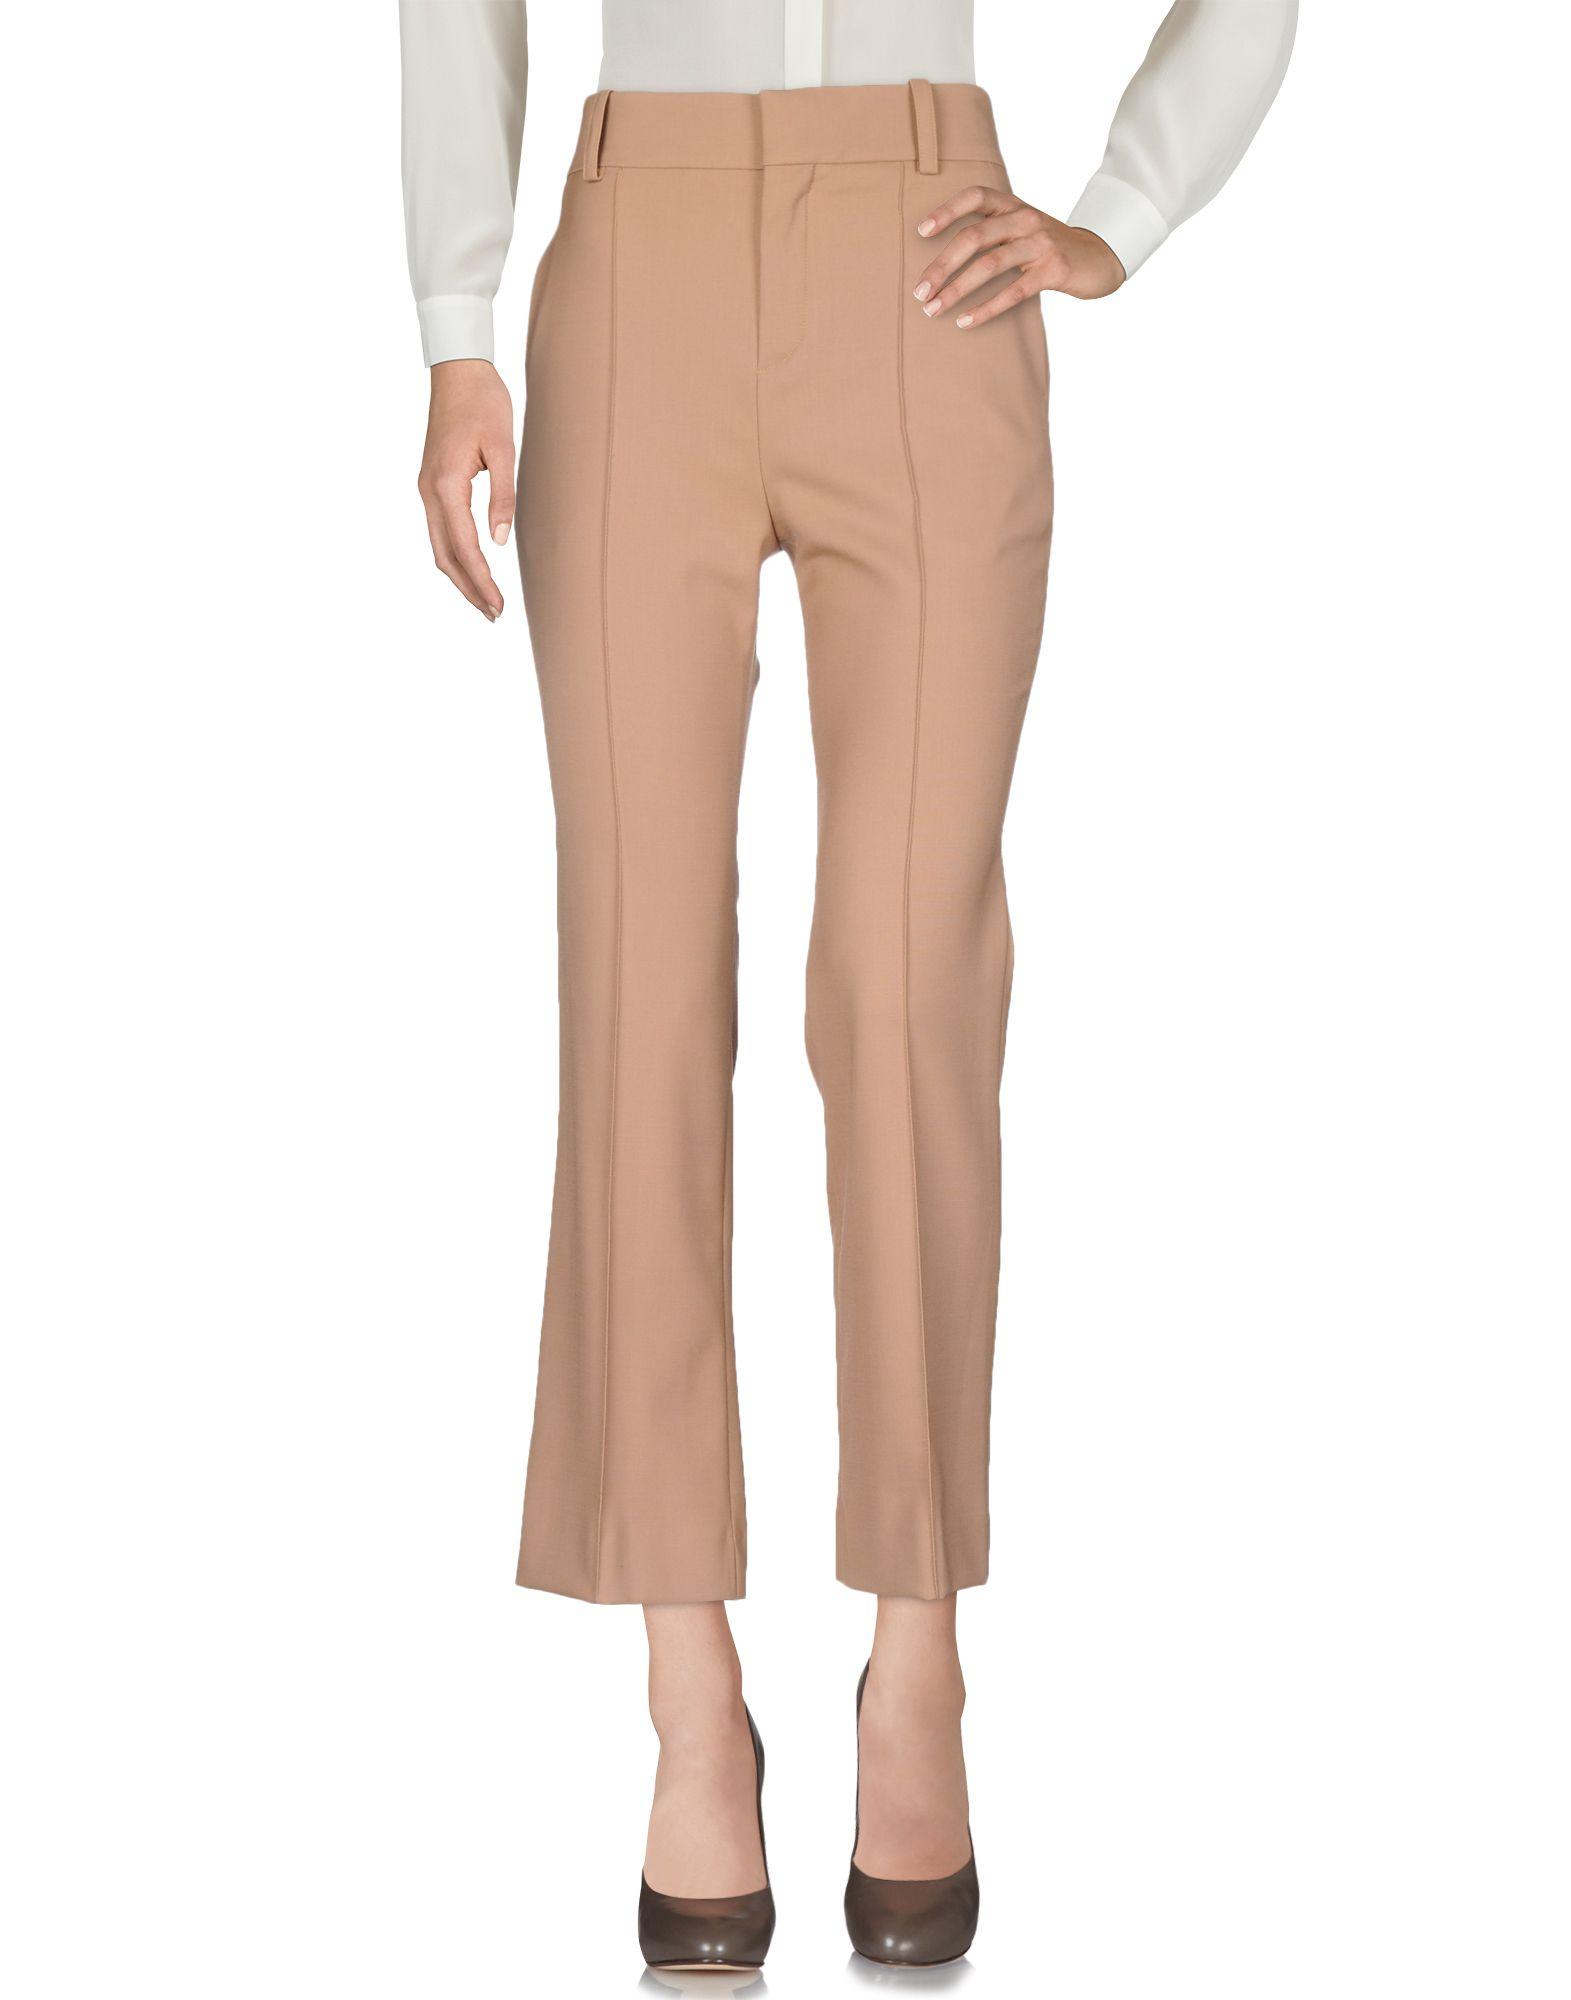 Pantalone Chloé Donna - Acquista online su AJxcossPhu